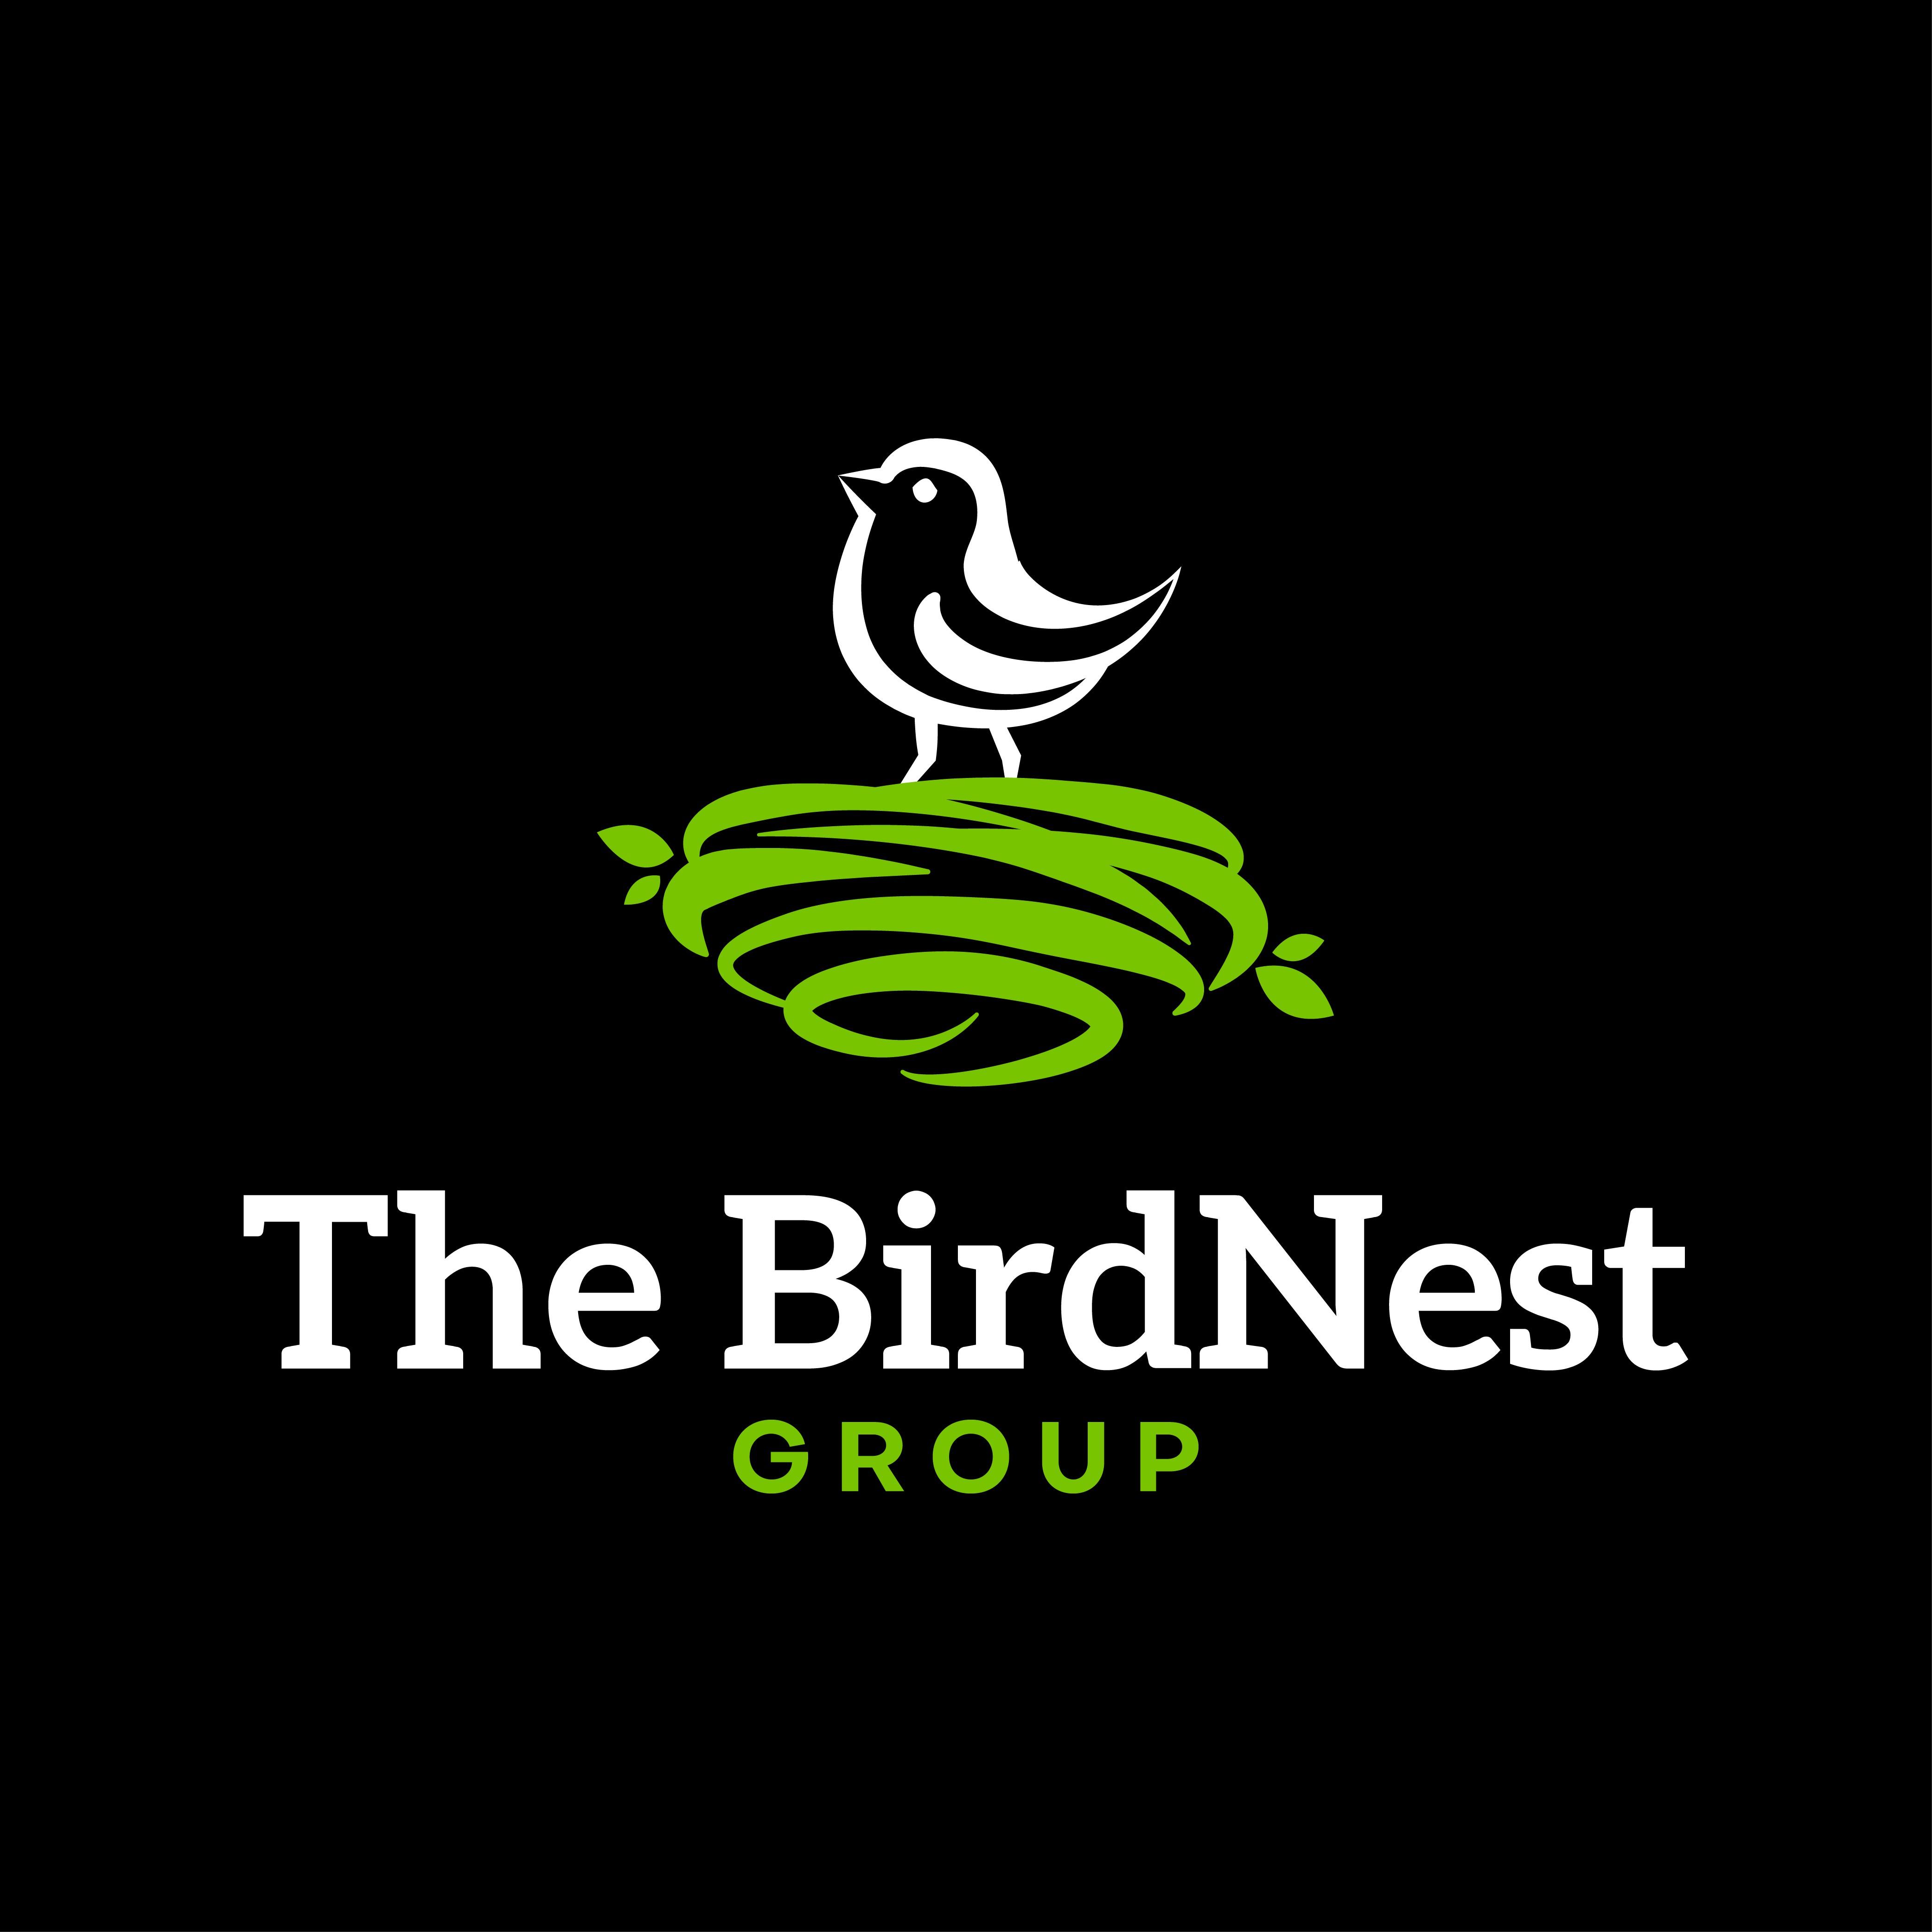 The BirdNest Group